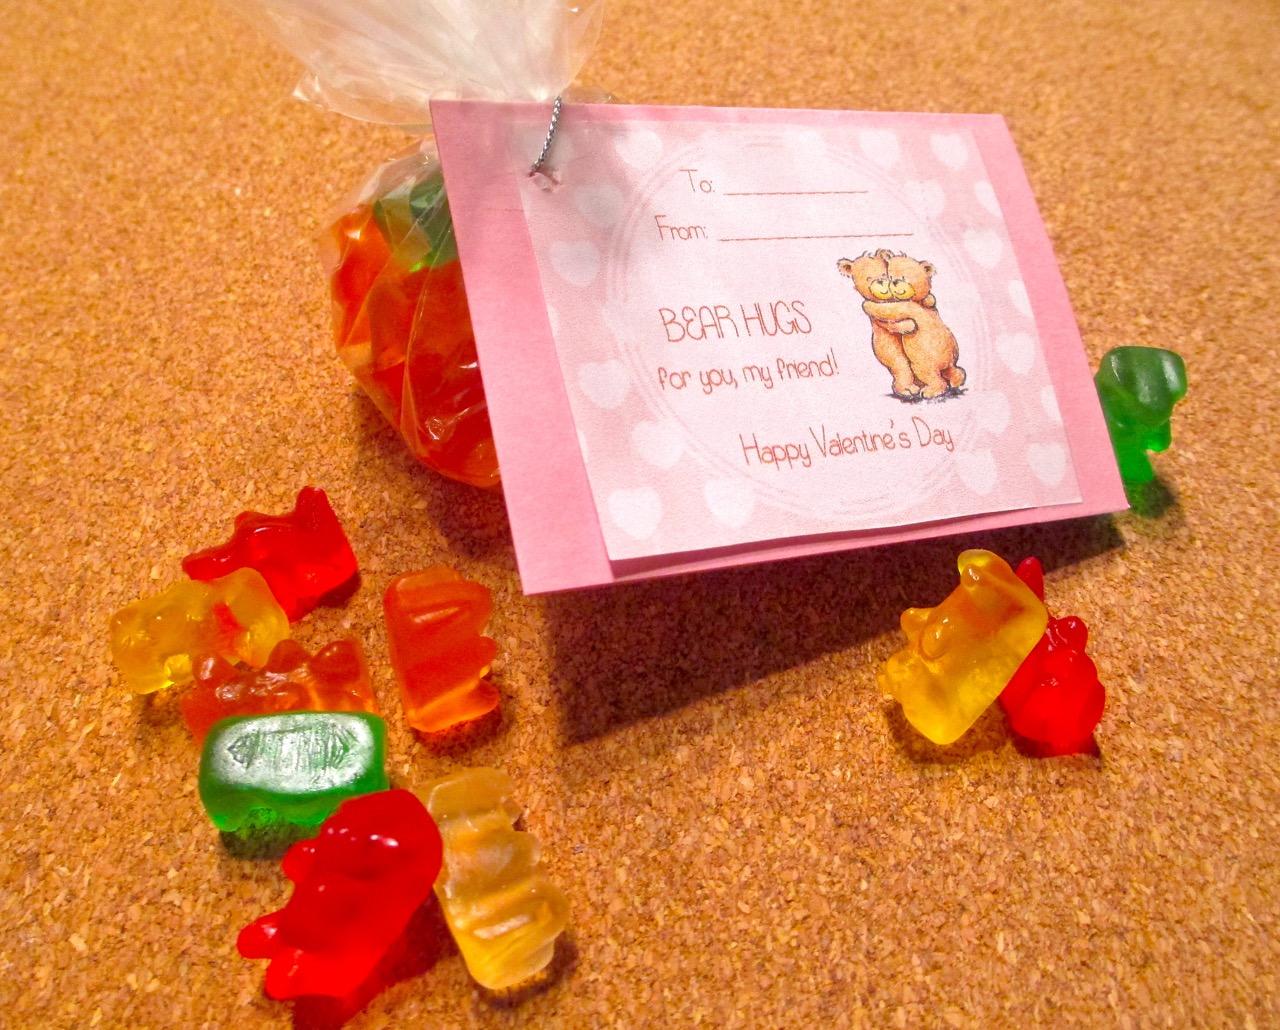 Semi Homemade Valentine 1: Gummy Bear Hugs